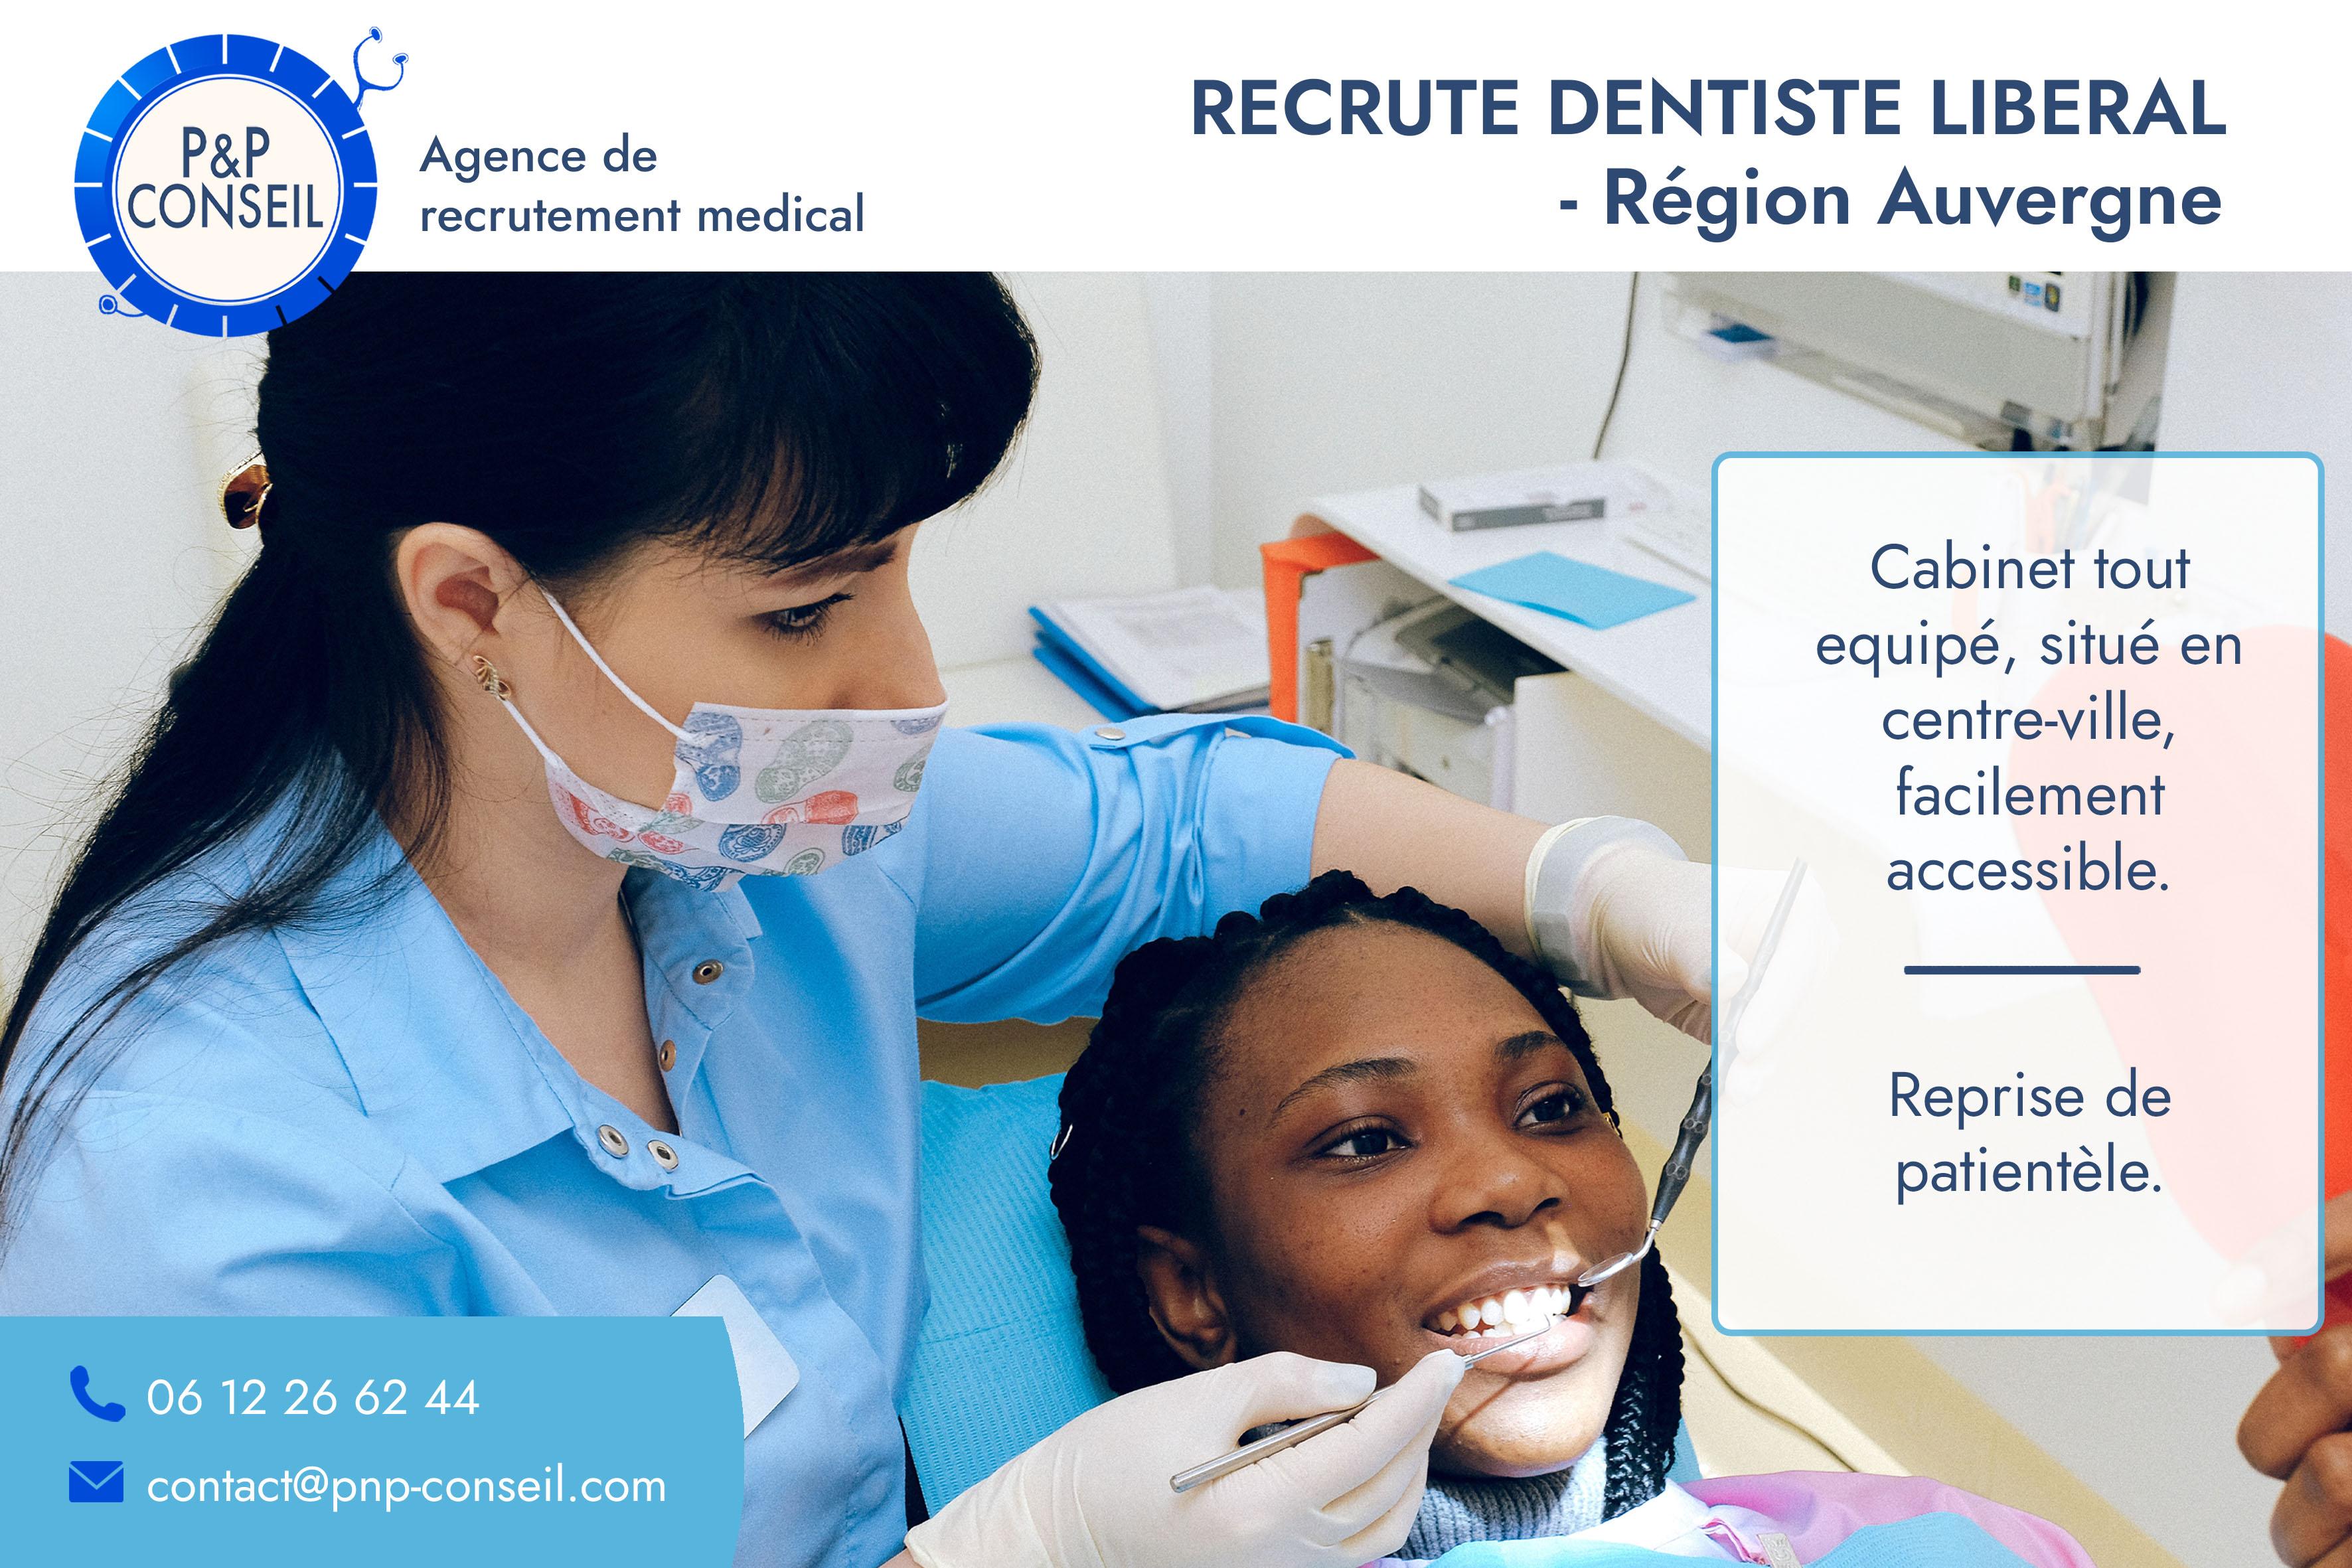 dentiste-liberal-auverg